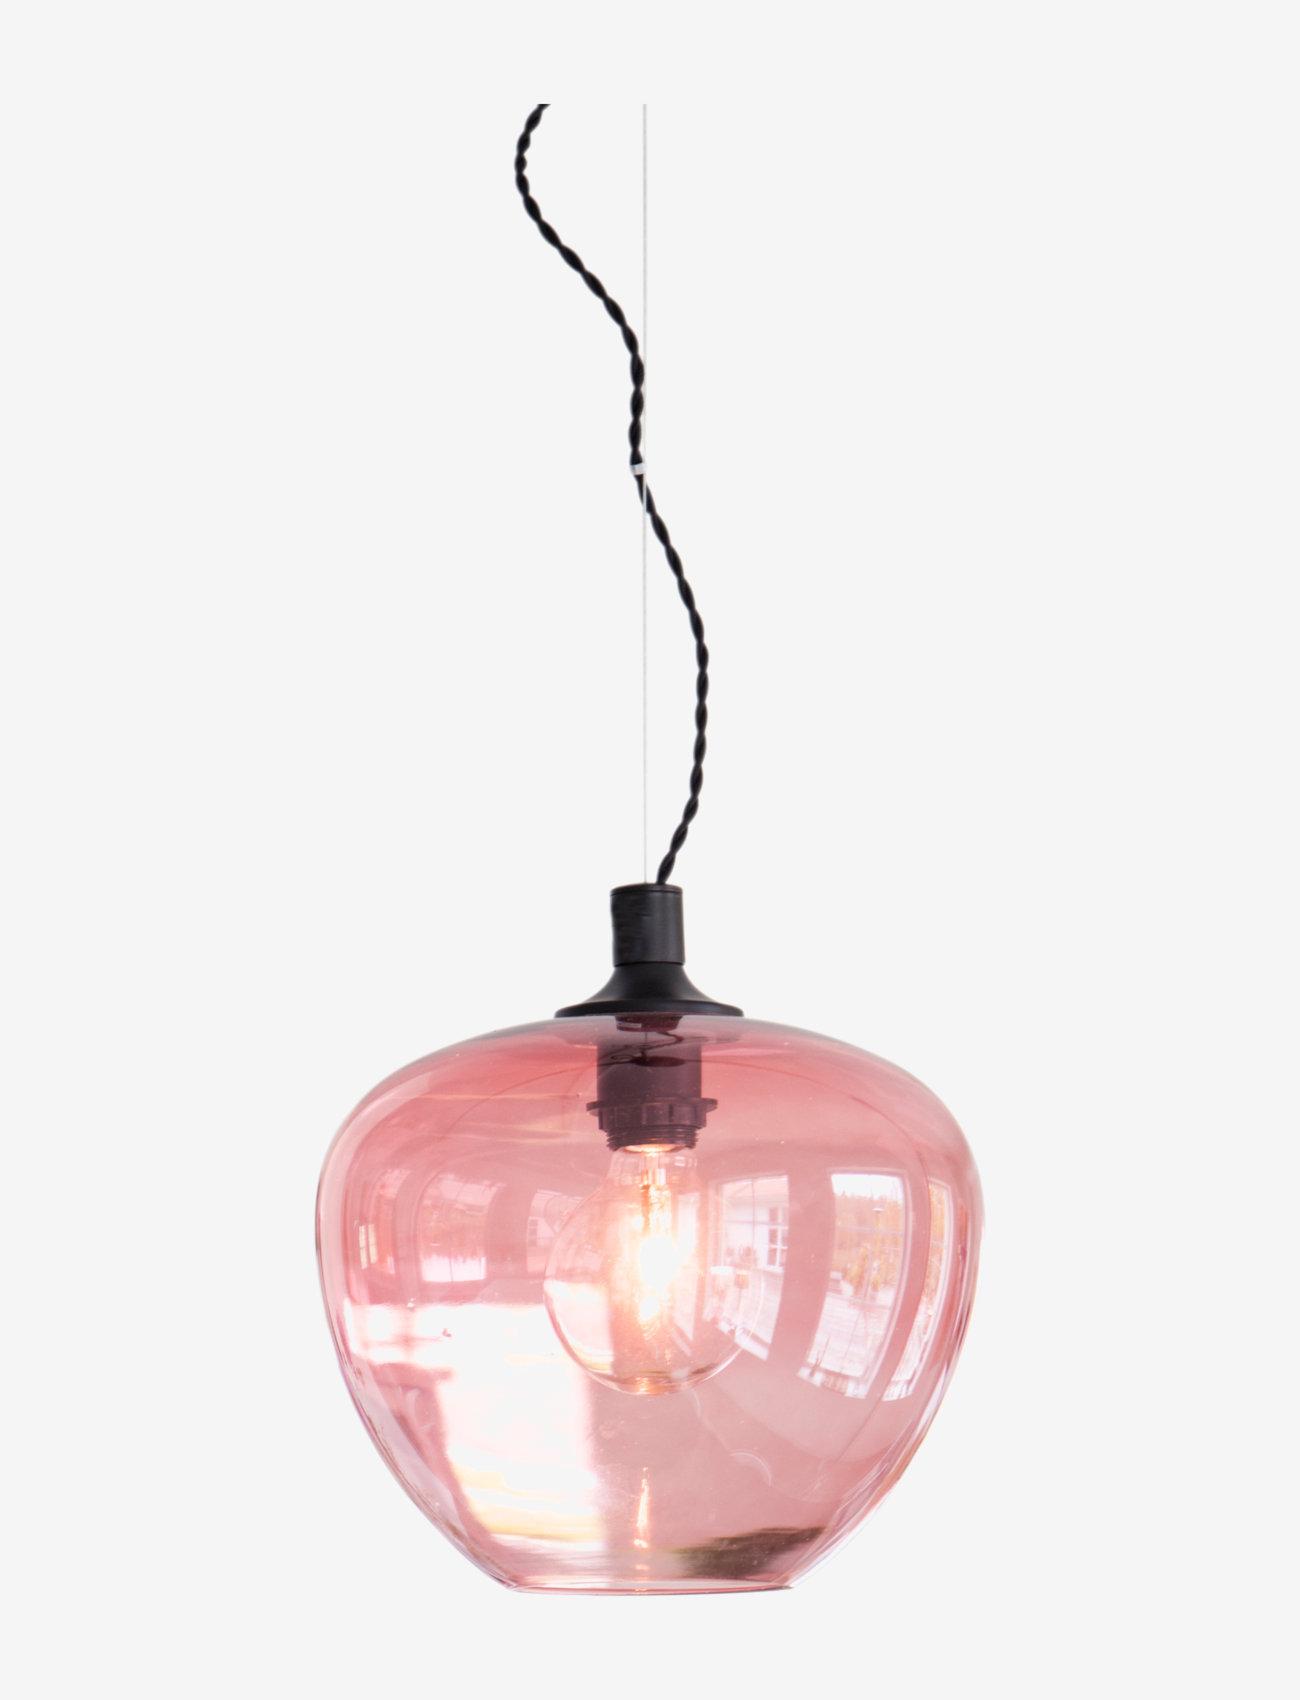 By Rydéns - Ceiling lamp Bellissimo - pendler - pink - 0